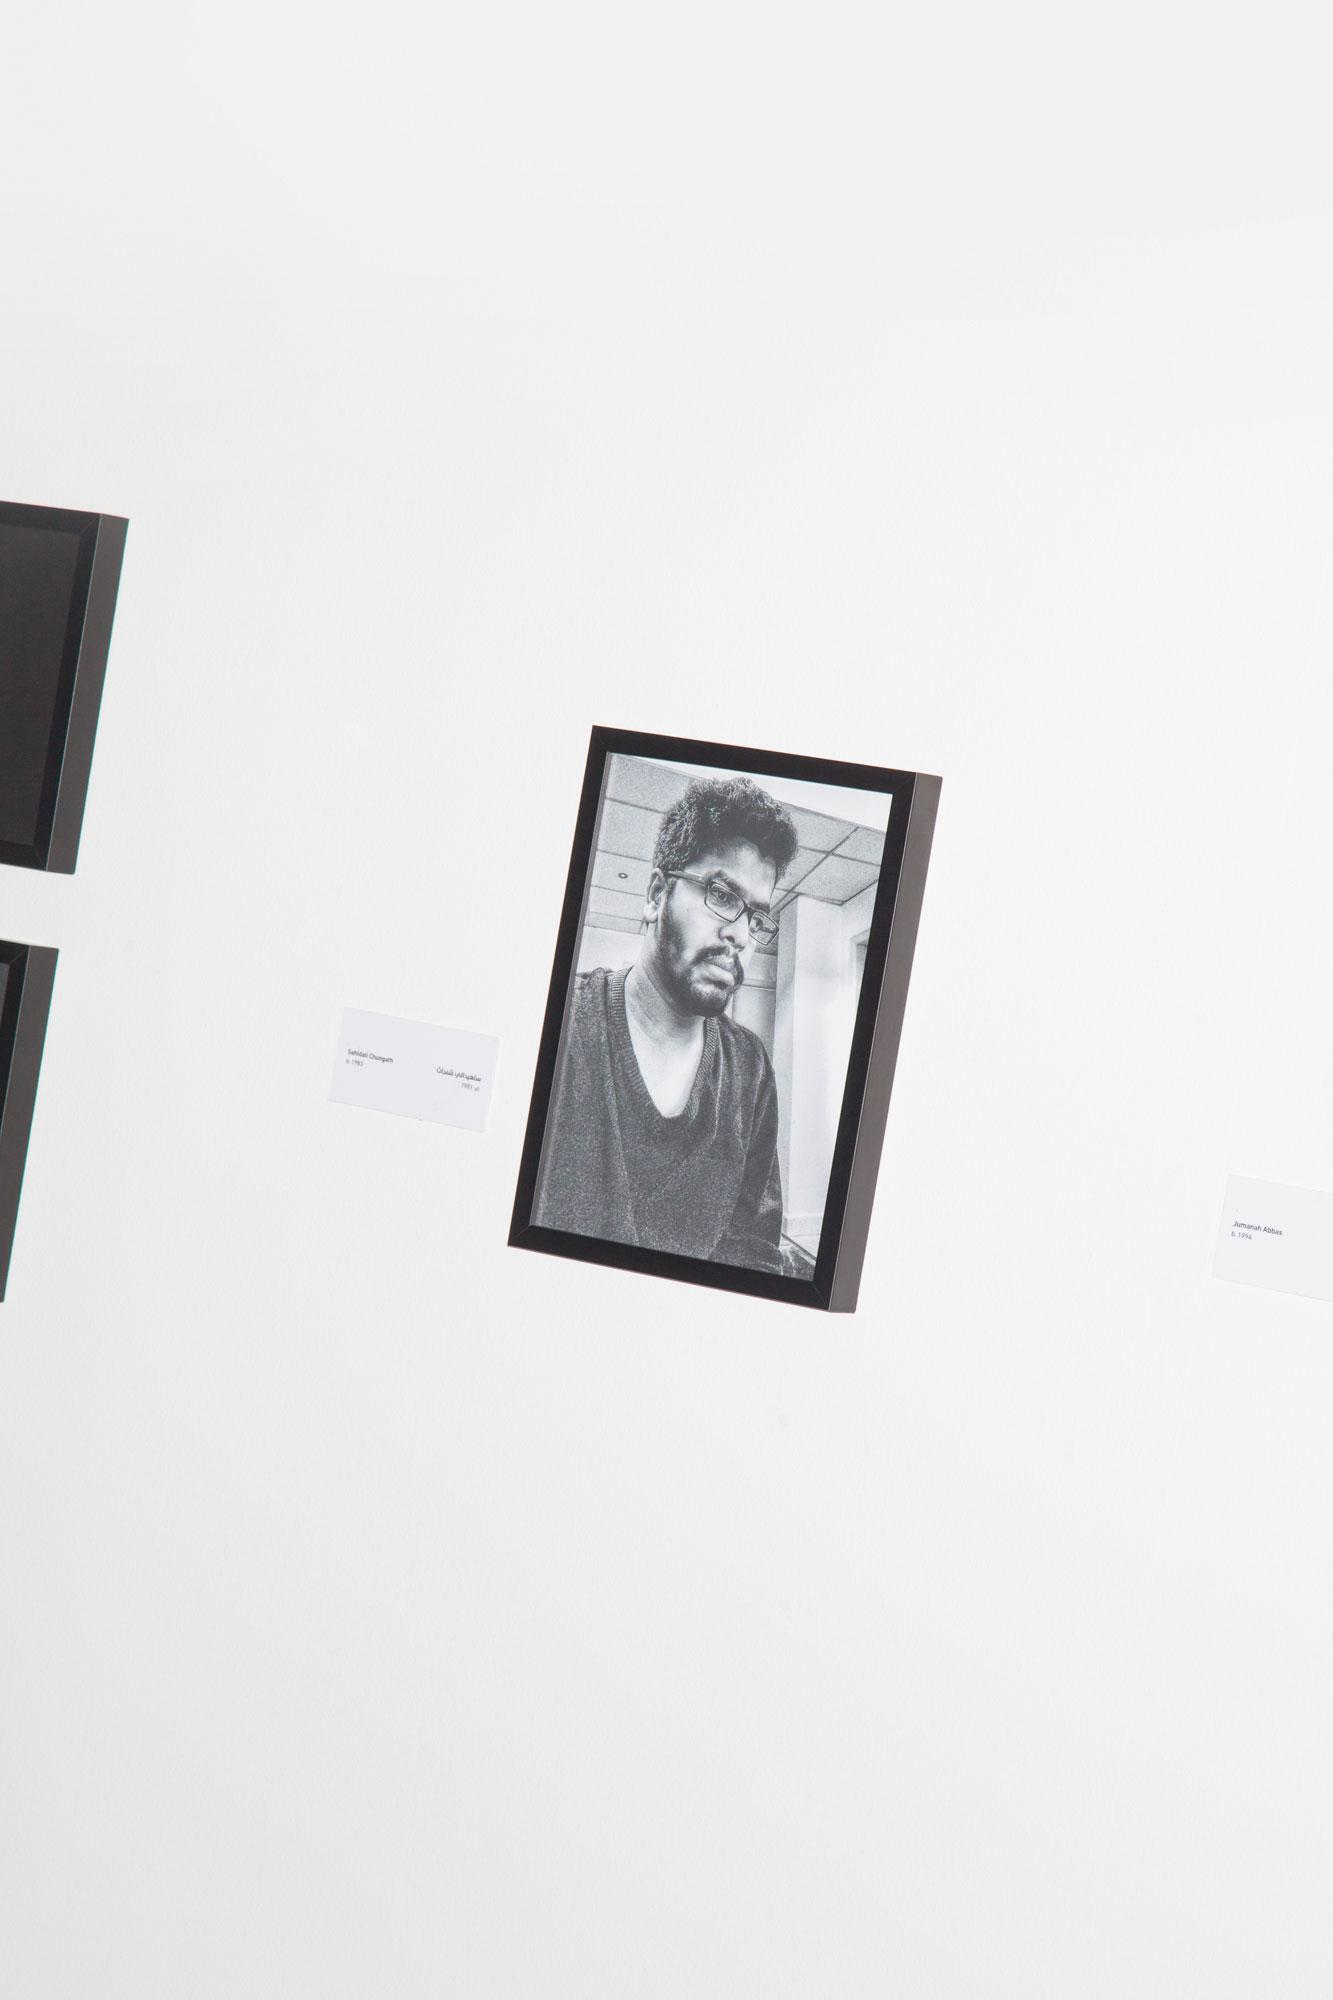 Sharjah Art Foundation /Self Portrait /bySahidali Chungath